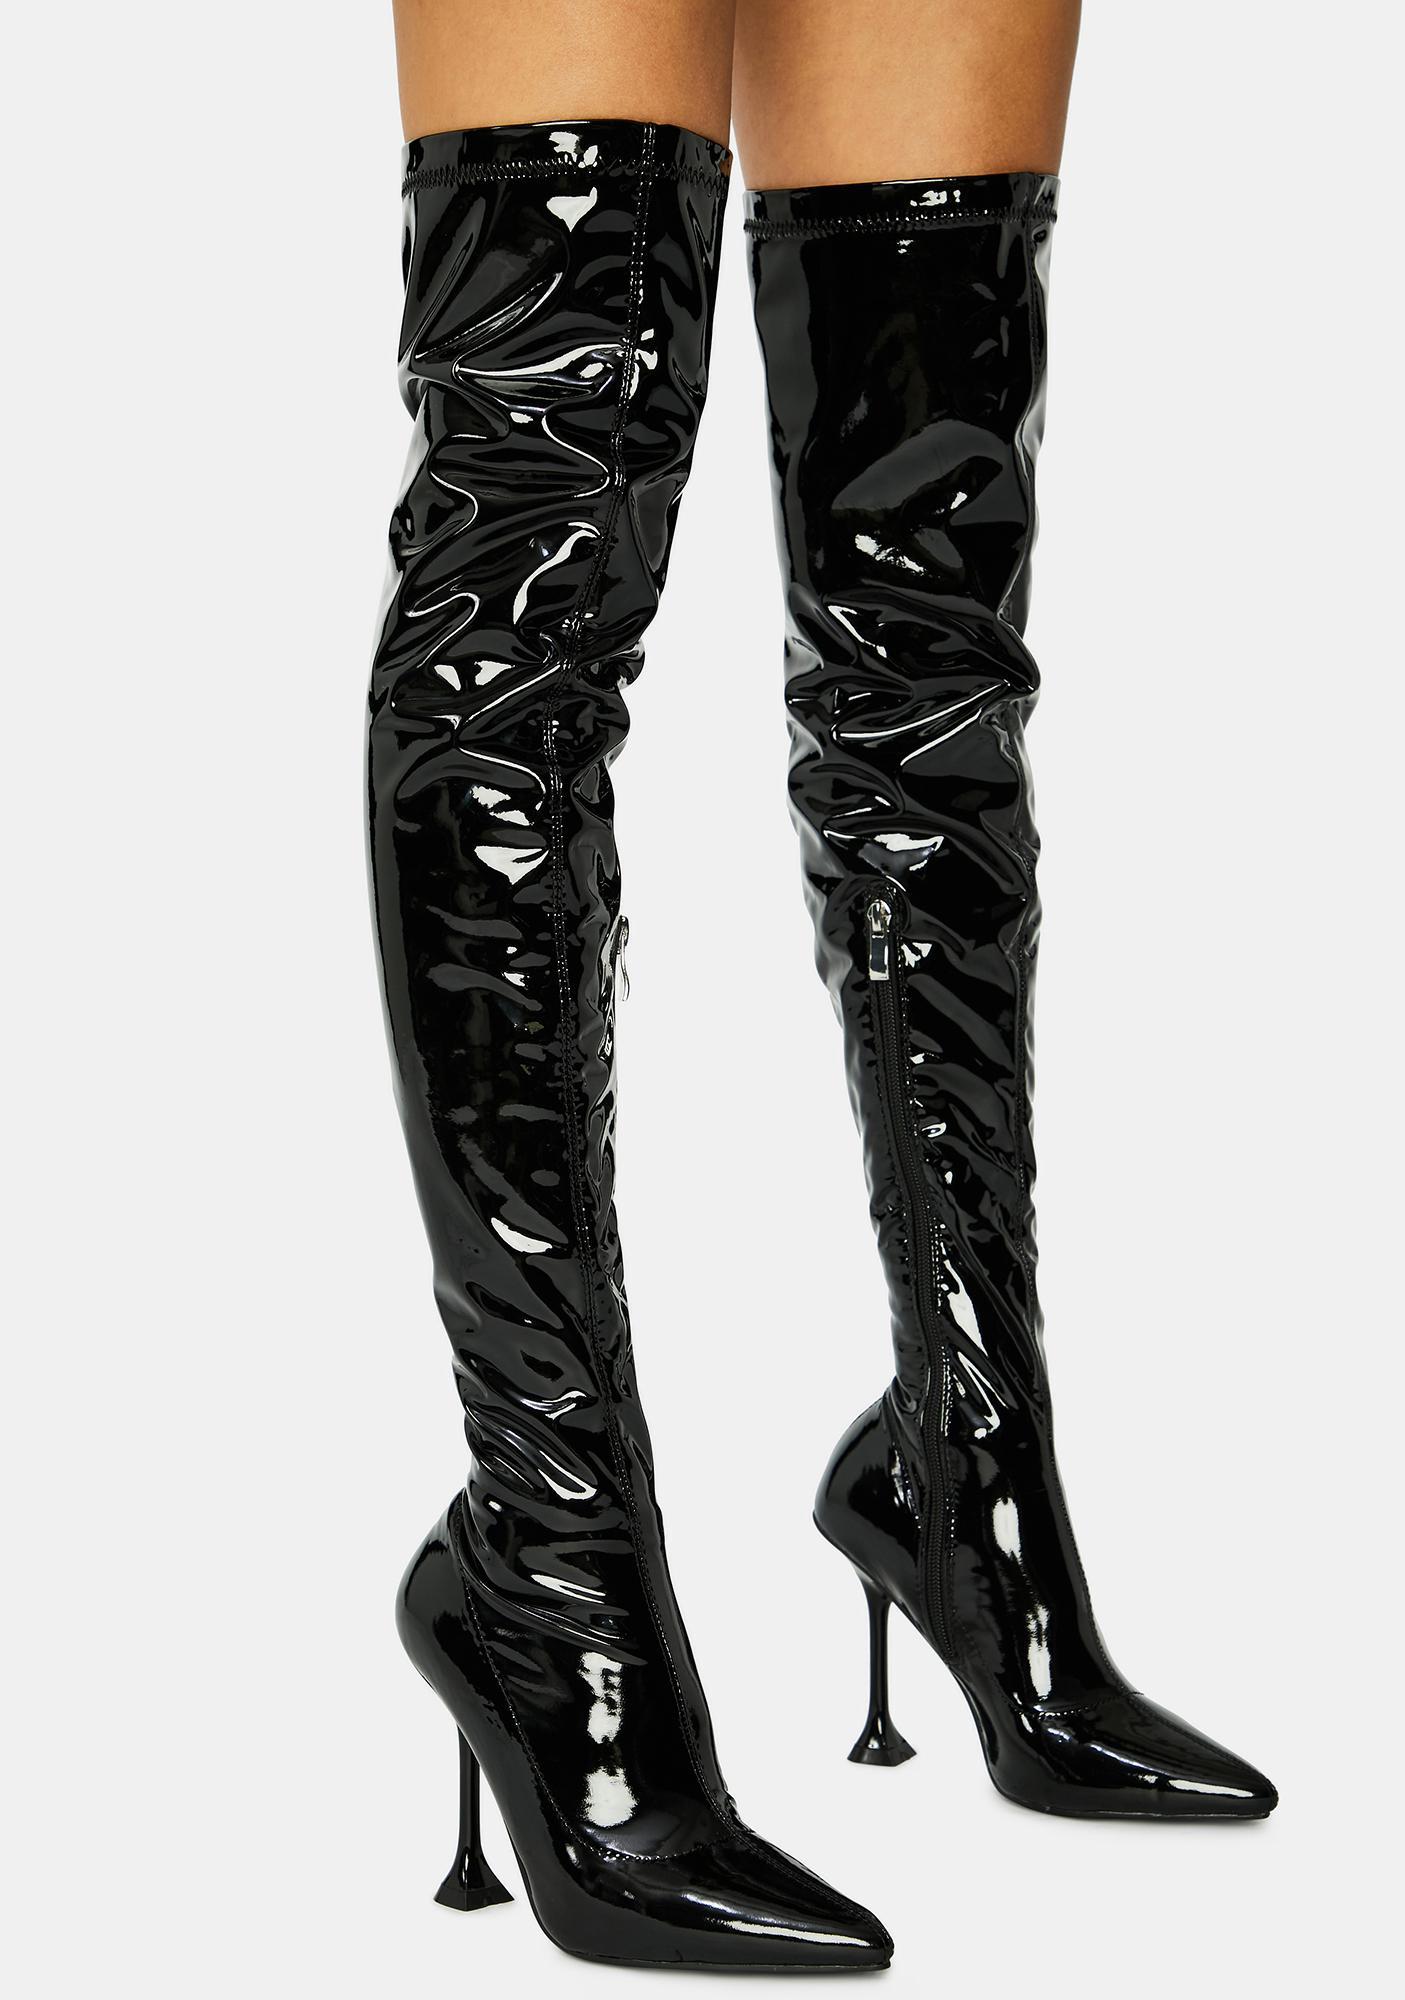 AZALEA WANG Checkmate Thigh High Boots